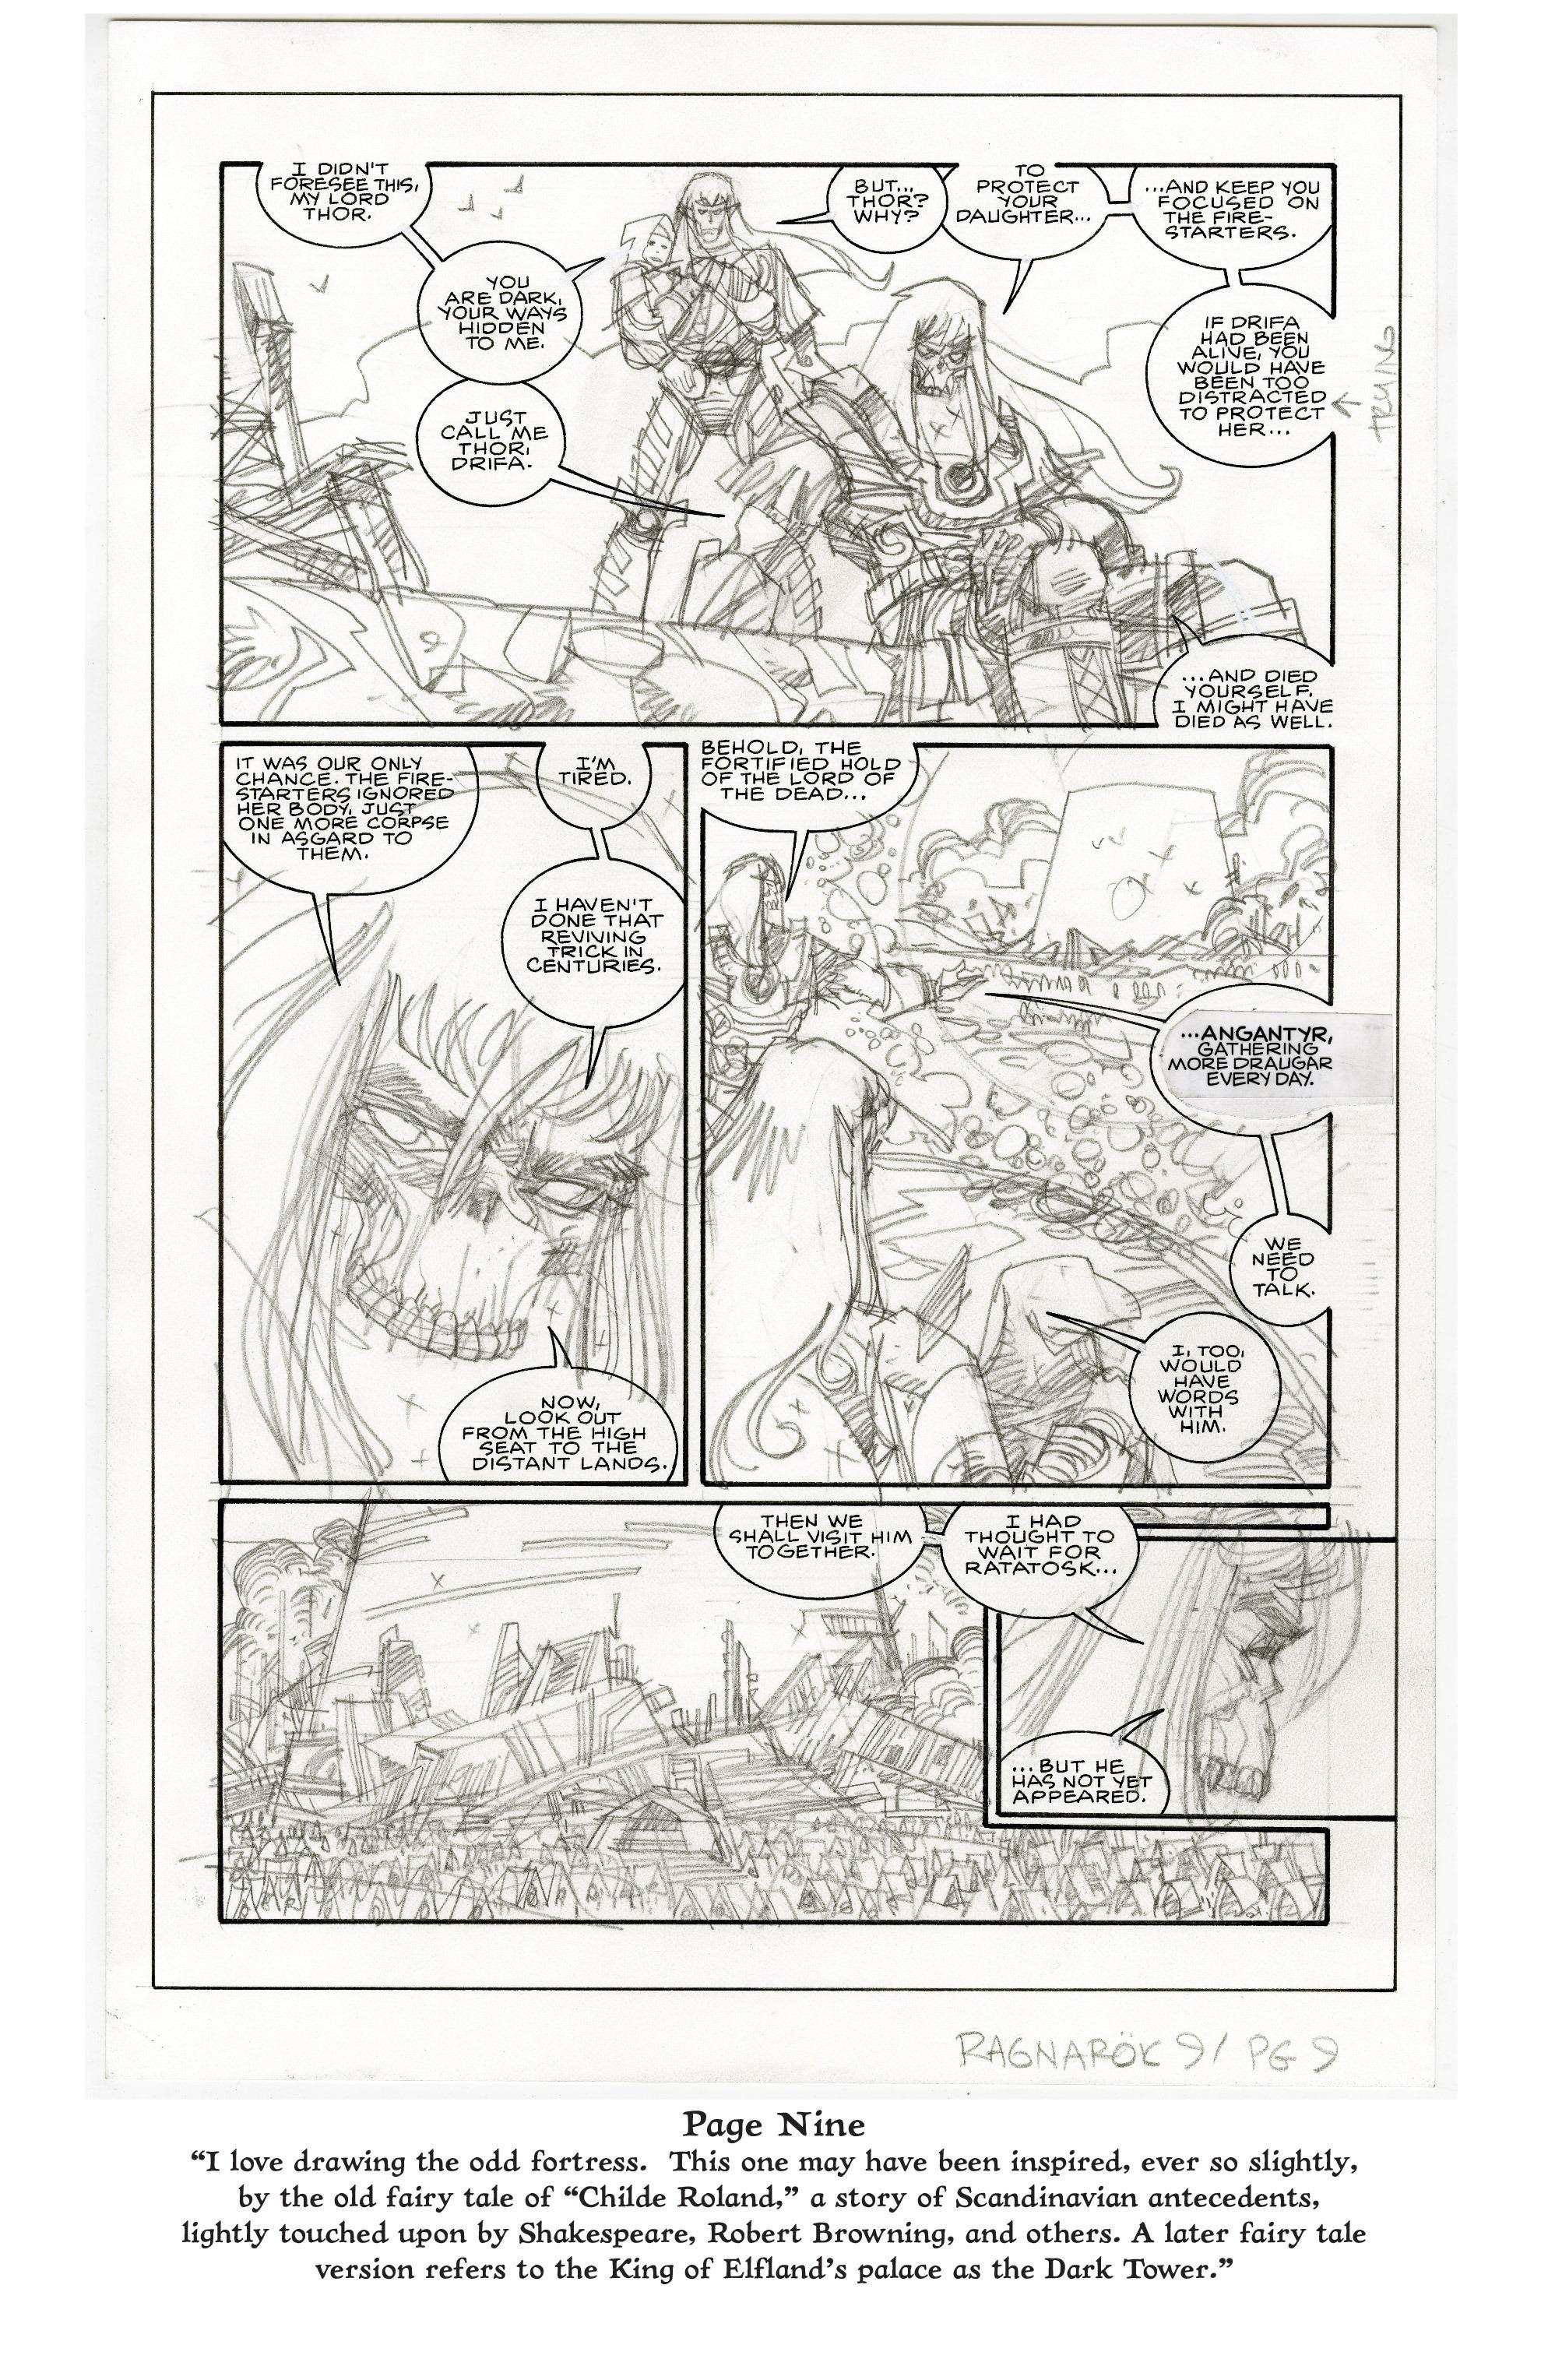 Read online Ragnarok comic -  Issue #9 - 29